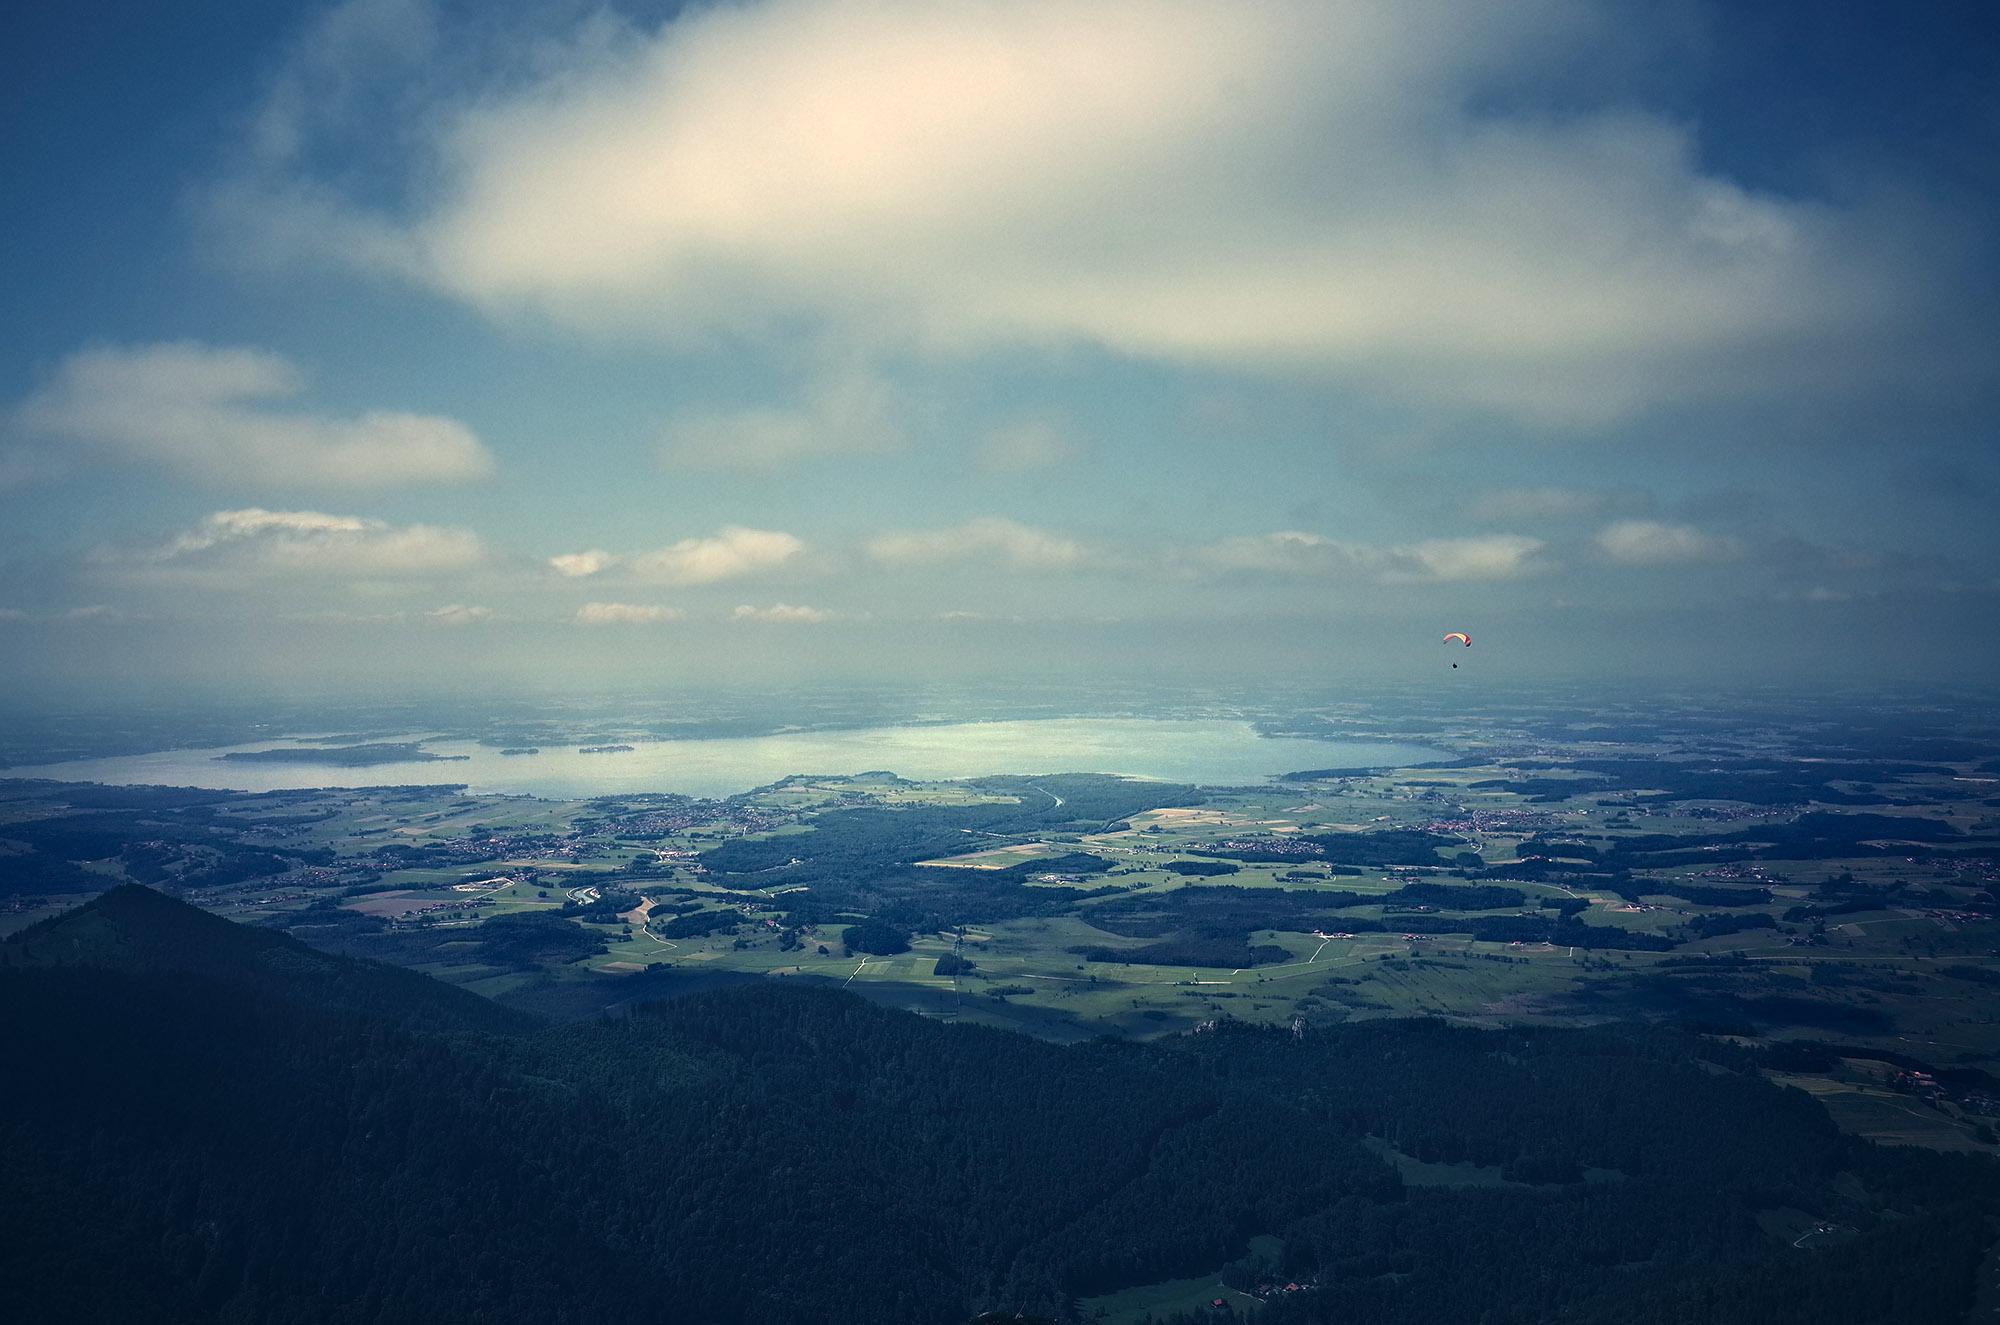 Mike_Abmaier_landscape.jpg